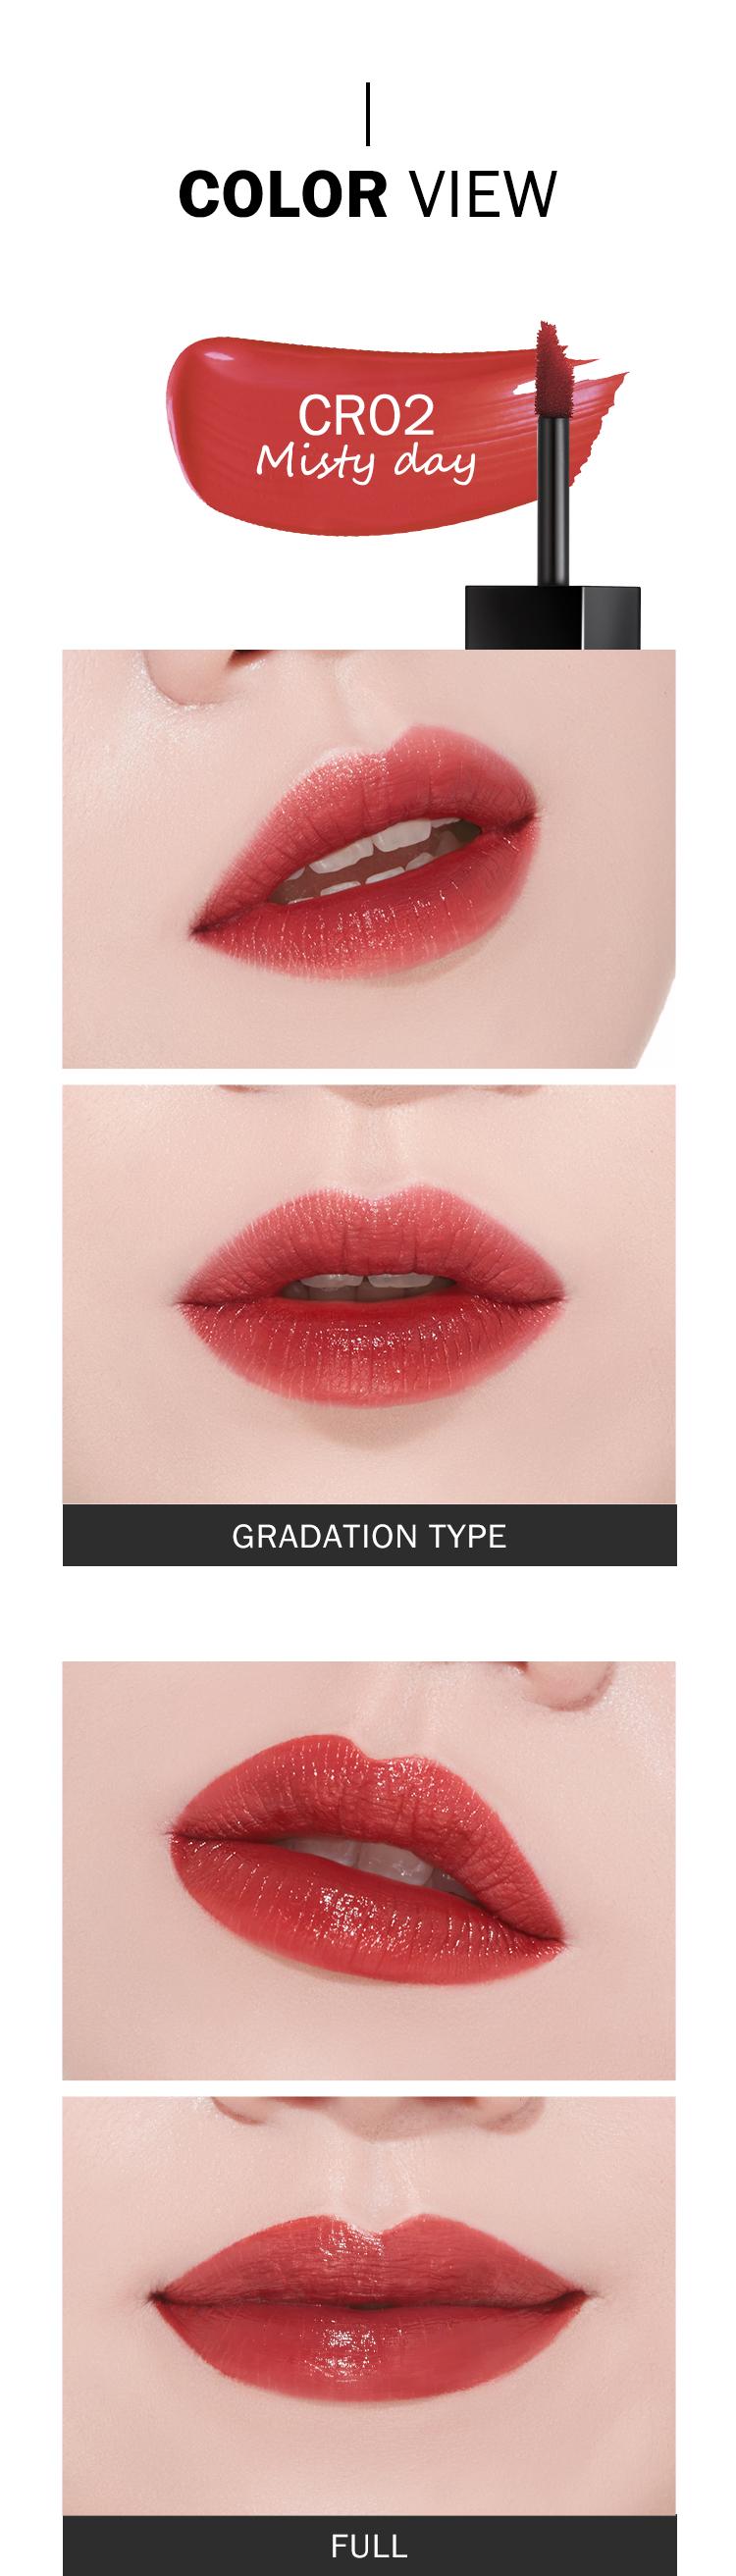 APIEU_Color_Lip_Stain_Gel_Tint_CR02_02.jpg